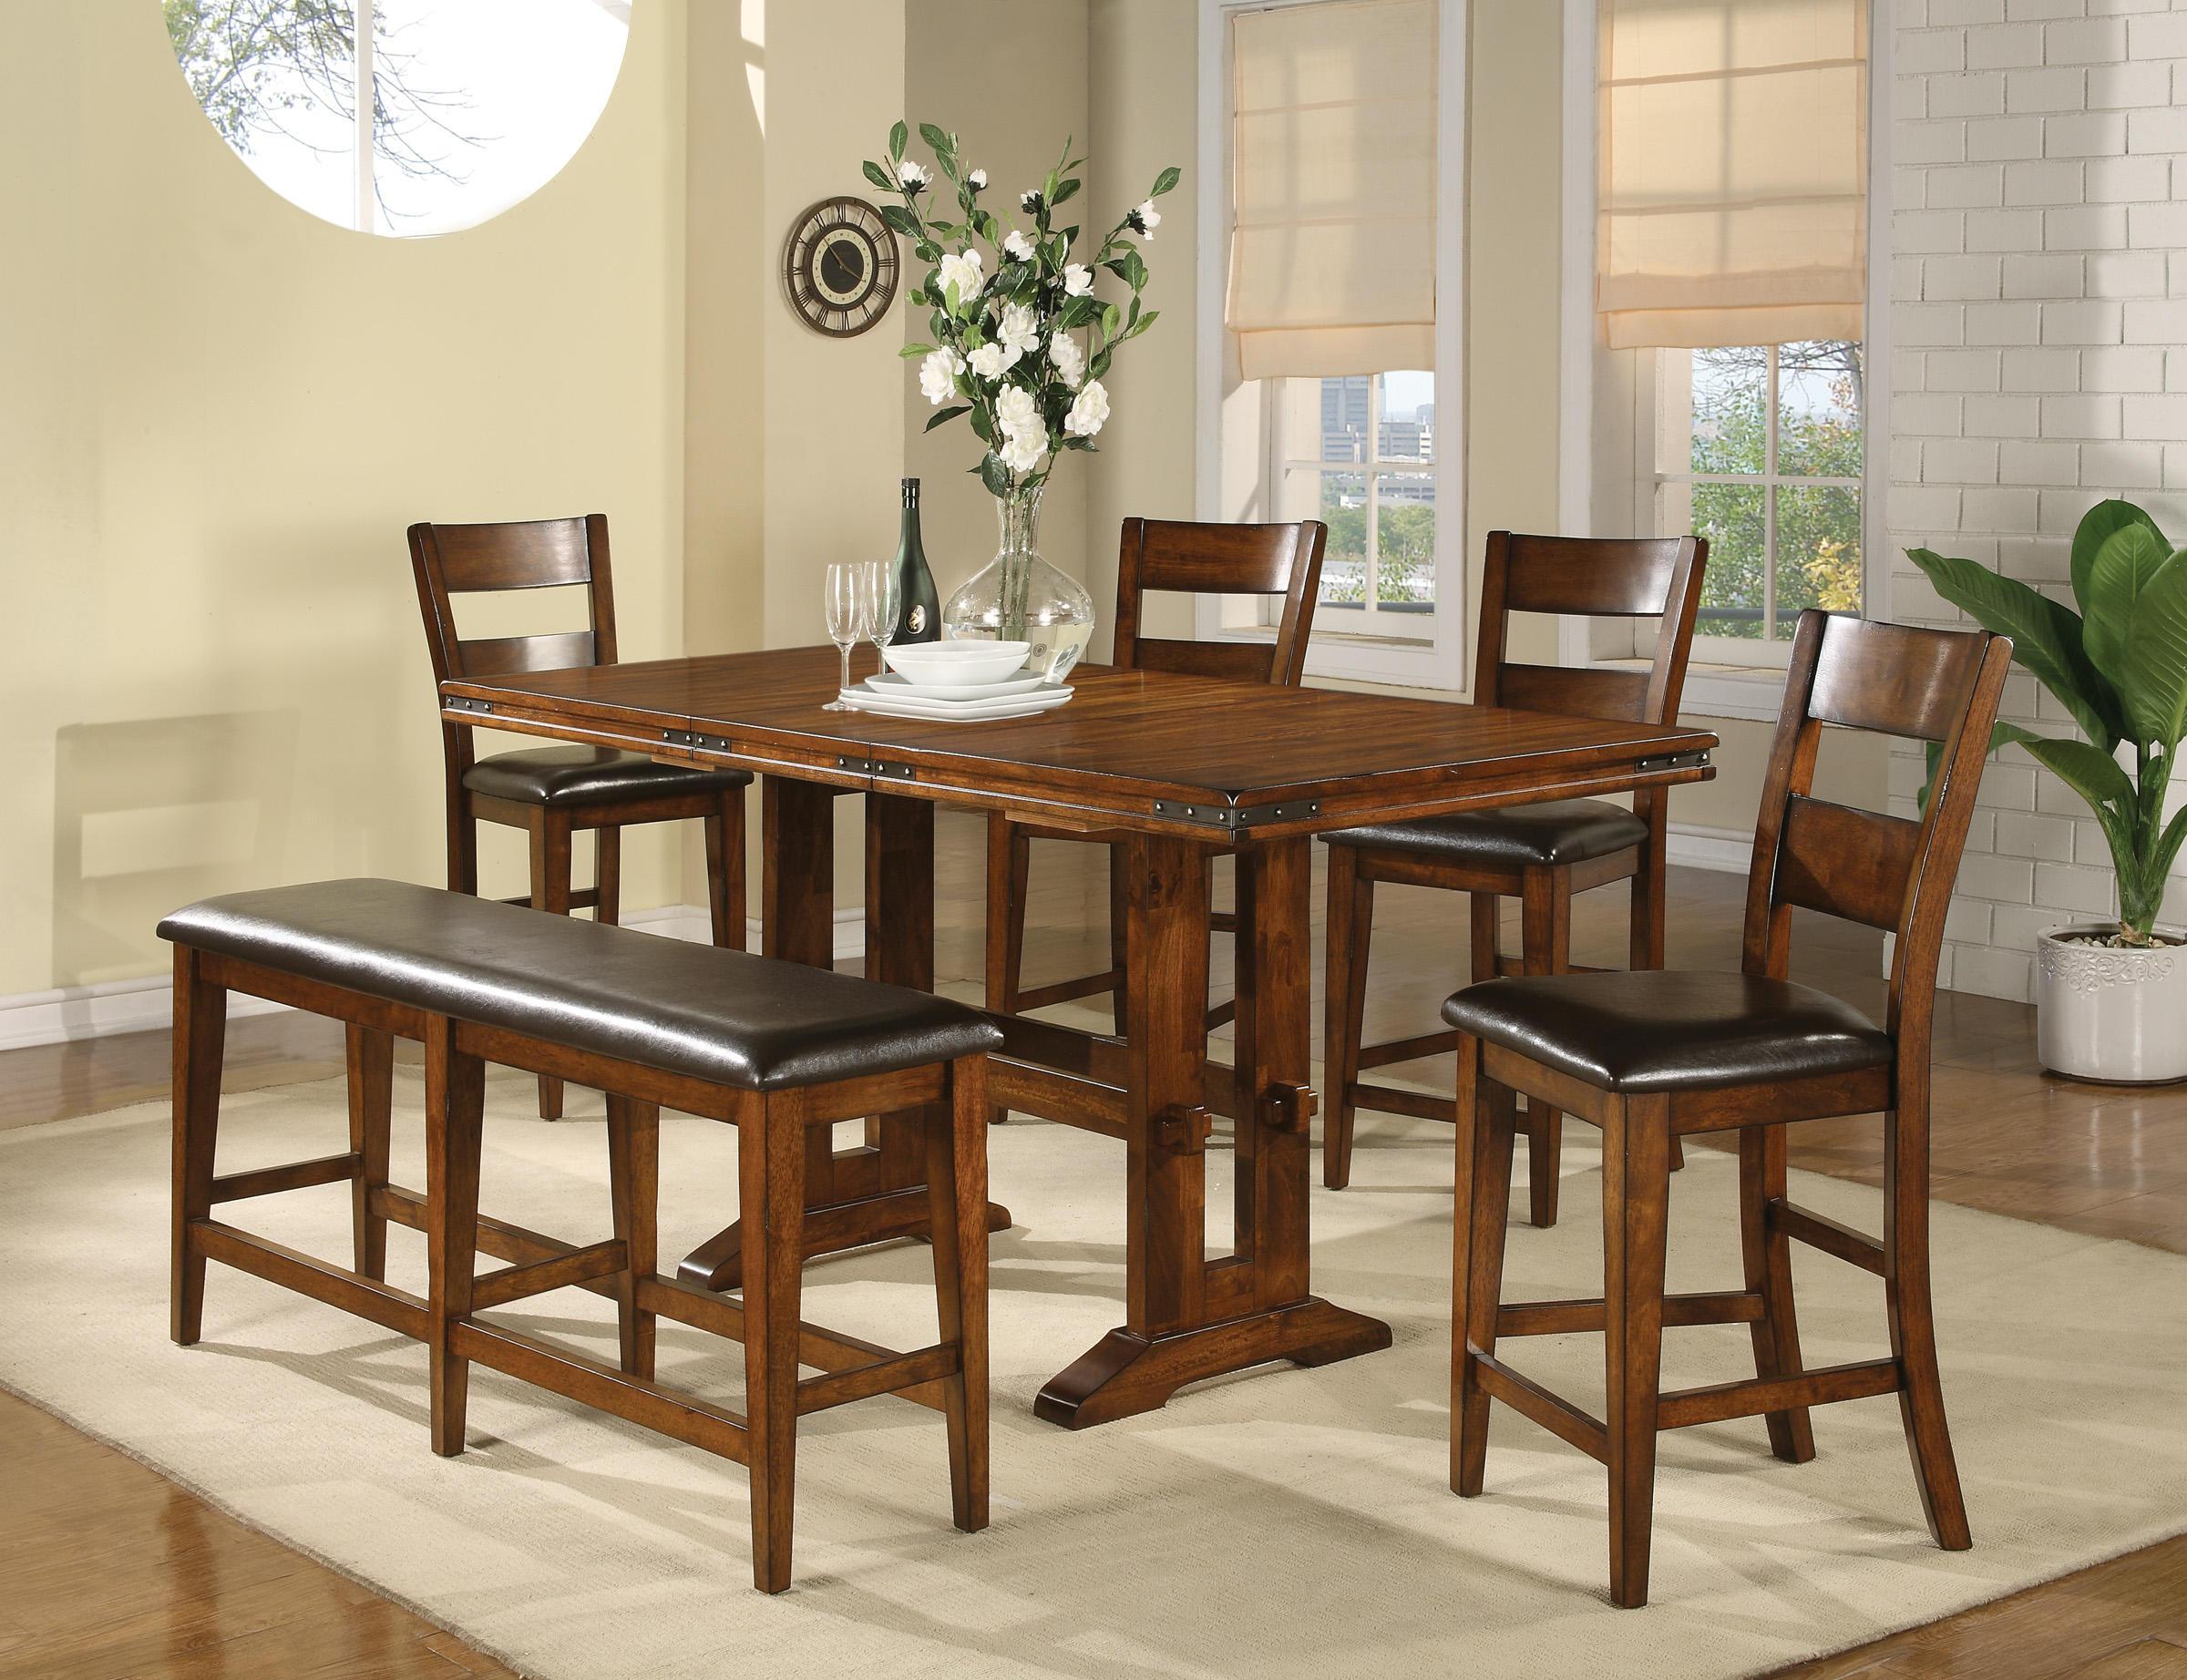 Whitmire's Furniture image 5